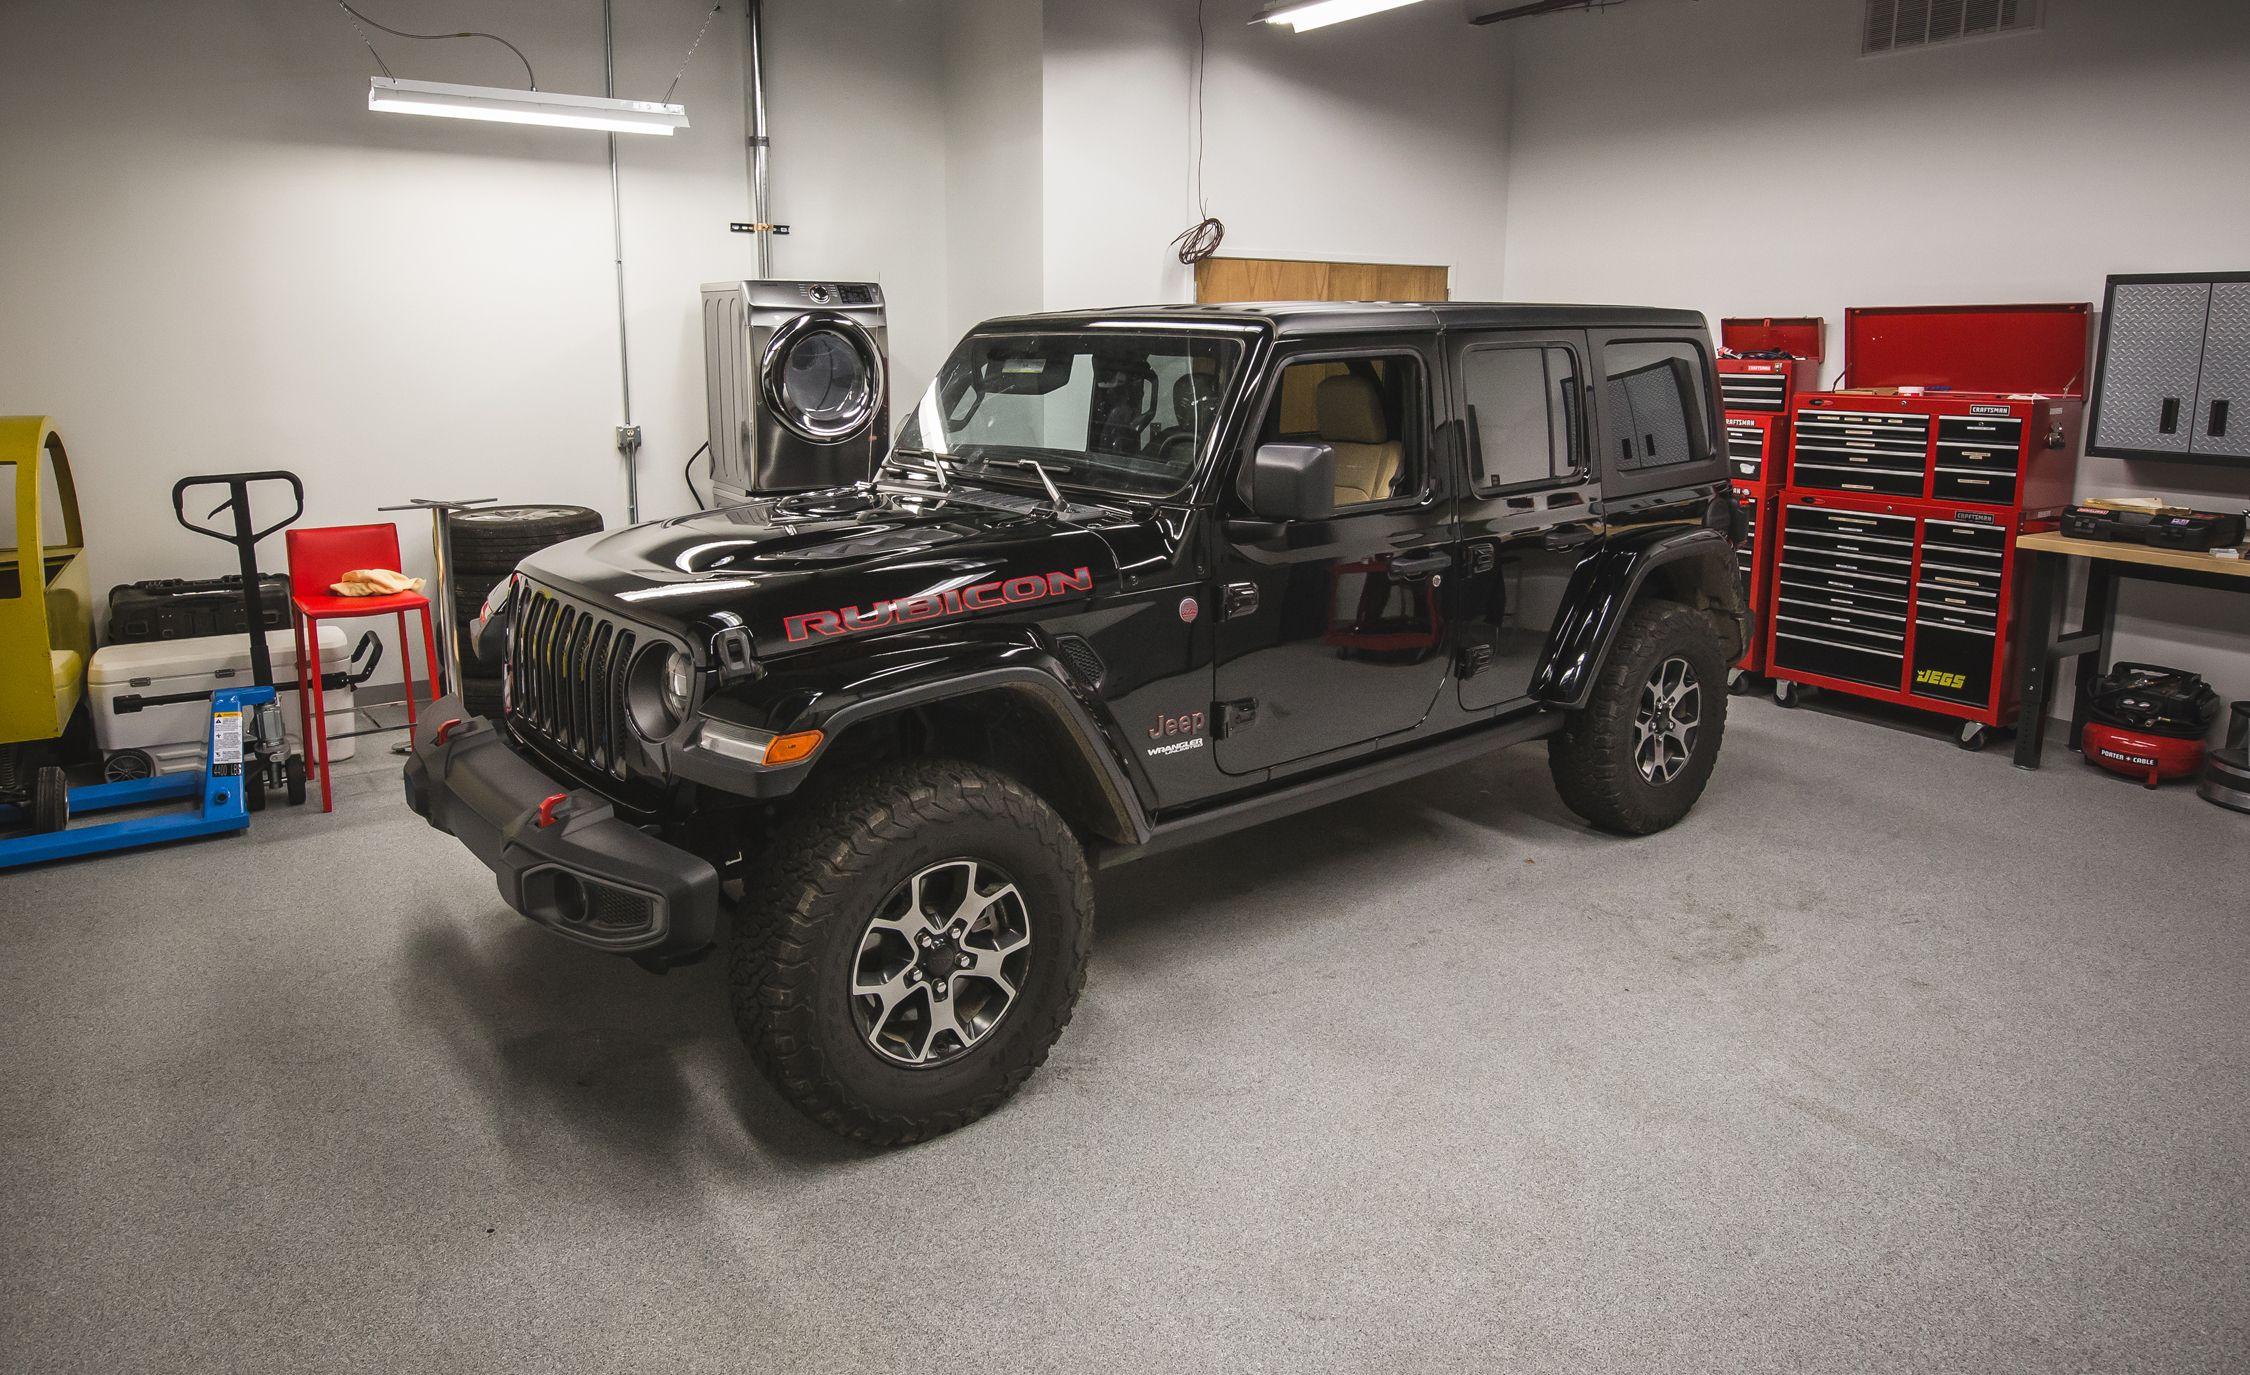 2019 Jeep Wrangler Reviews   Jeep Wrangler Price, Photos, and Specs   Car  and Driver